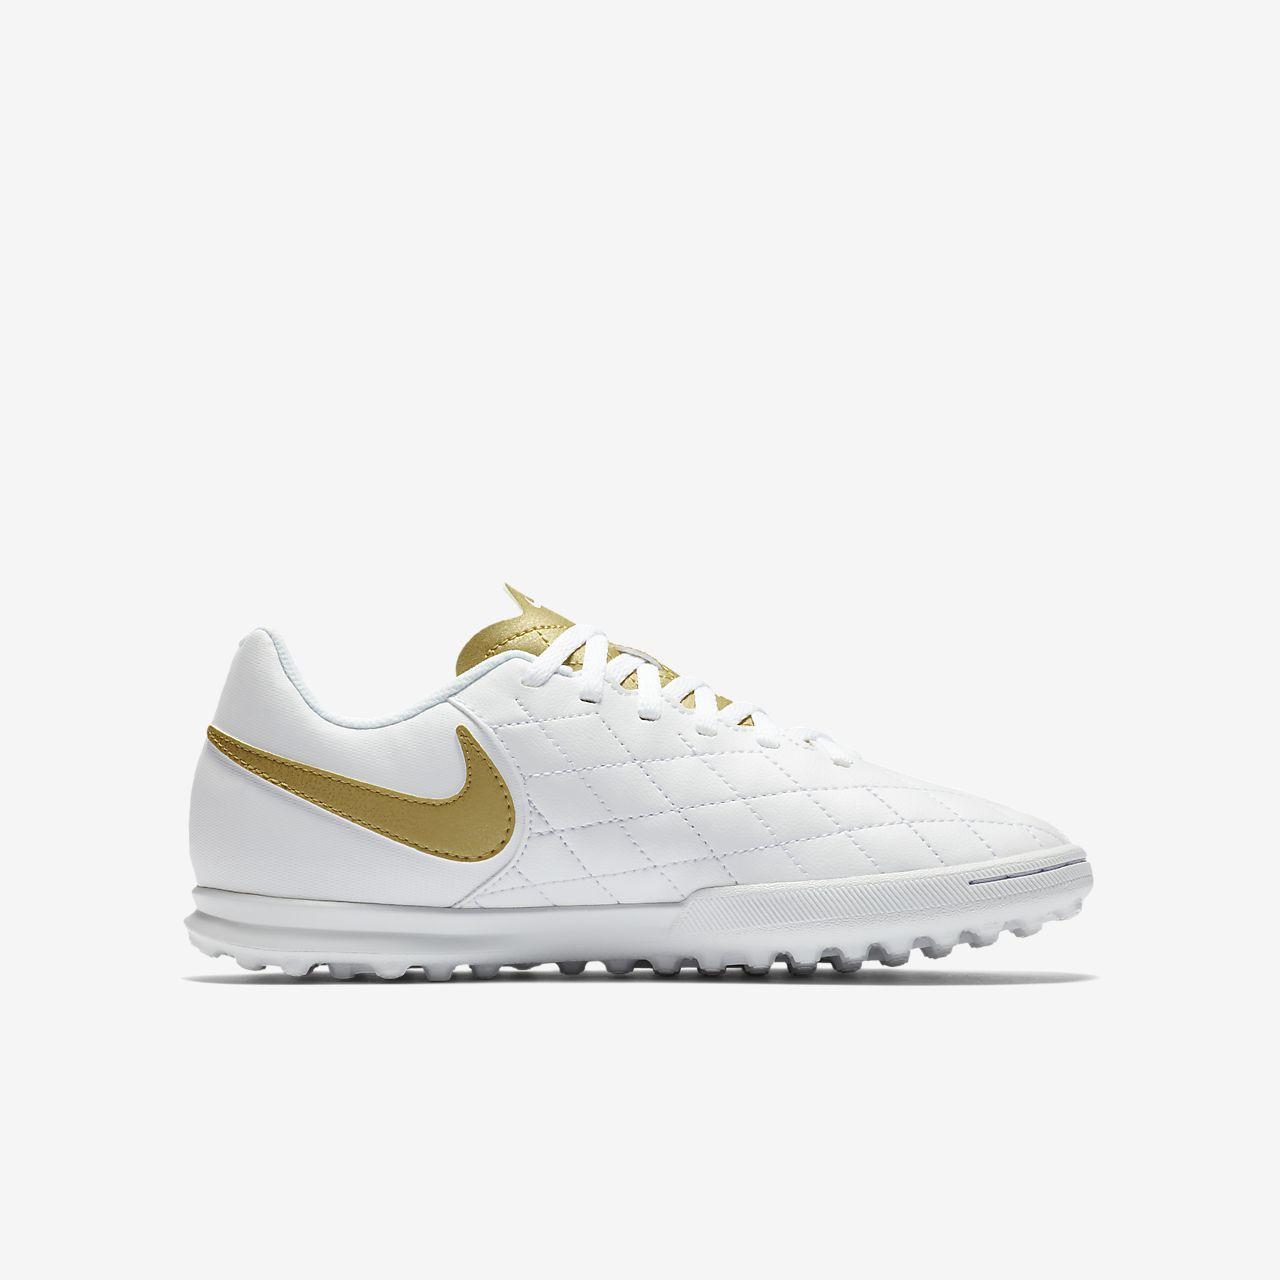 new style fe0f4 b8bda ... Turf Football Shoe. Nike Jr TiempoX Legend VII Club 10R TF